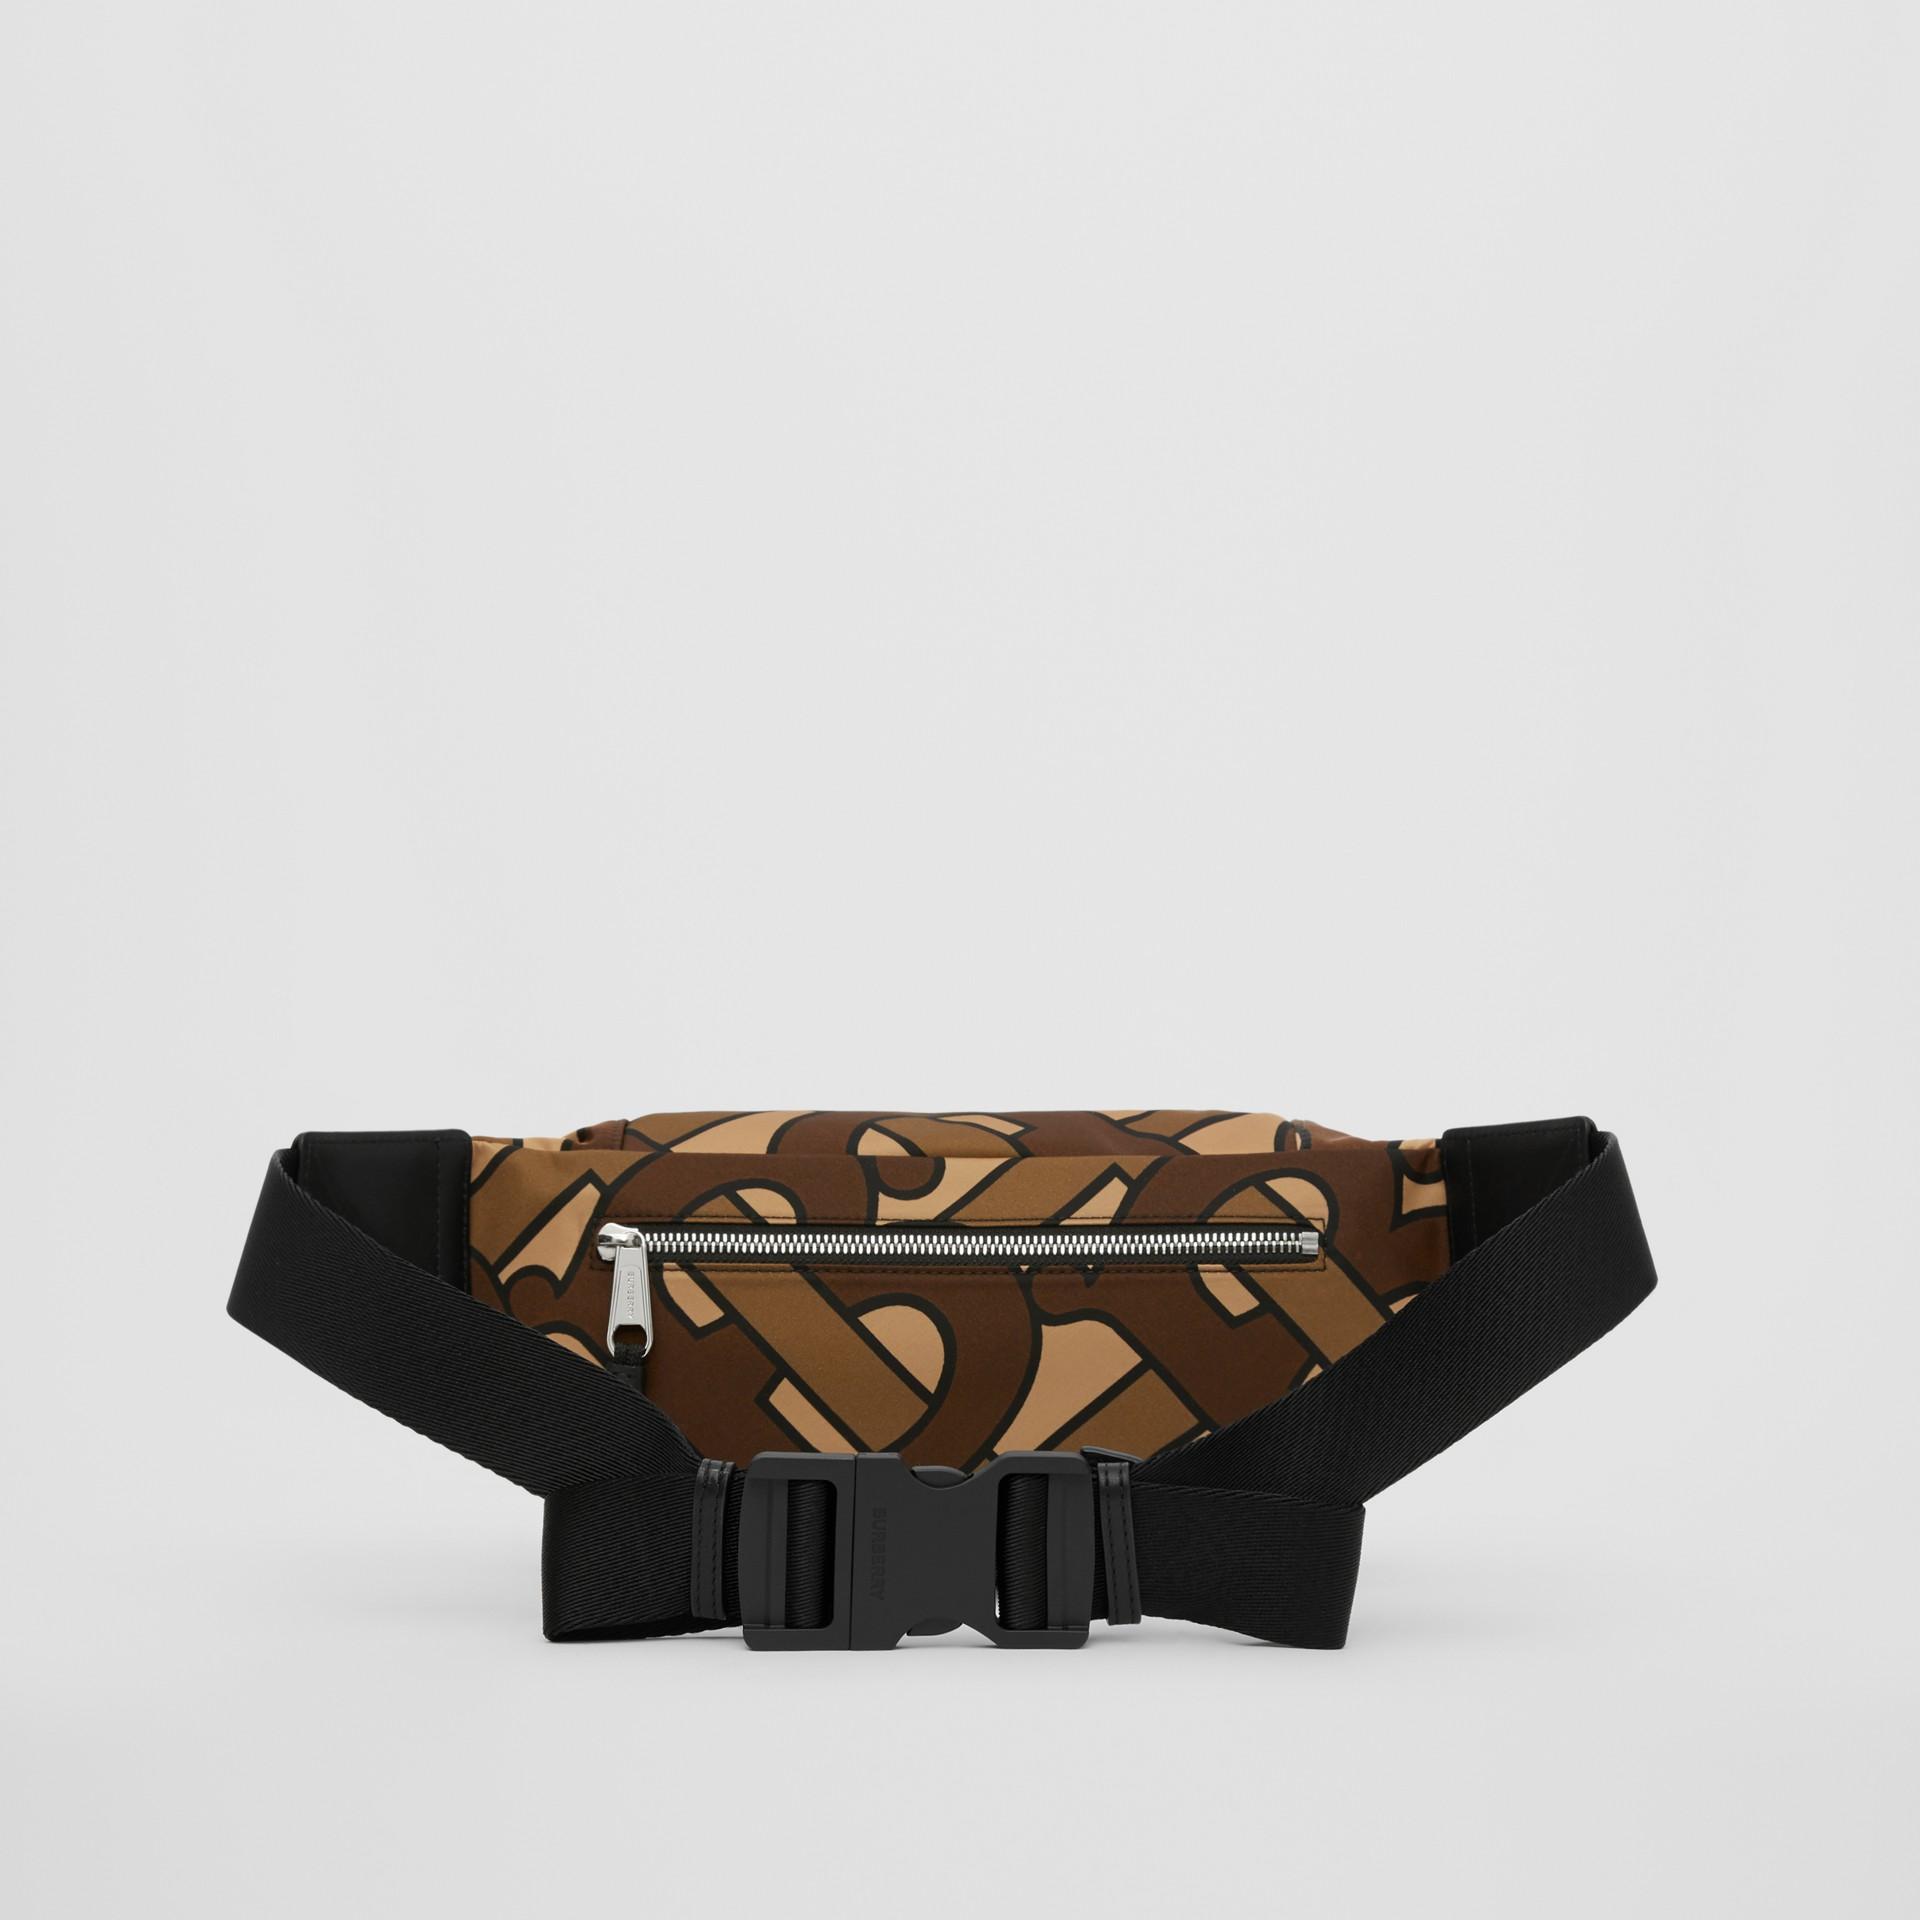 Monogram Print Nylon Sonny Bum Bag in Bridle Brown - Men | Burberry - gallery image 9